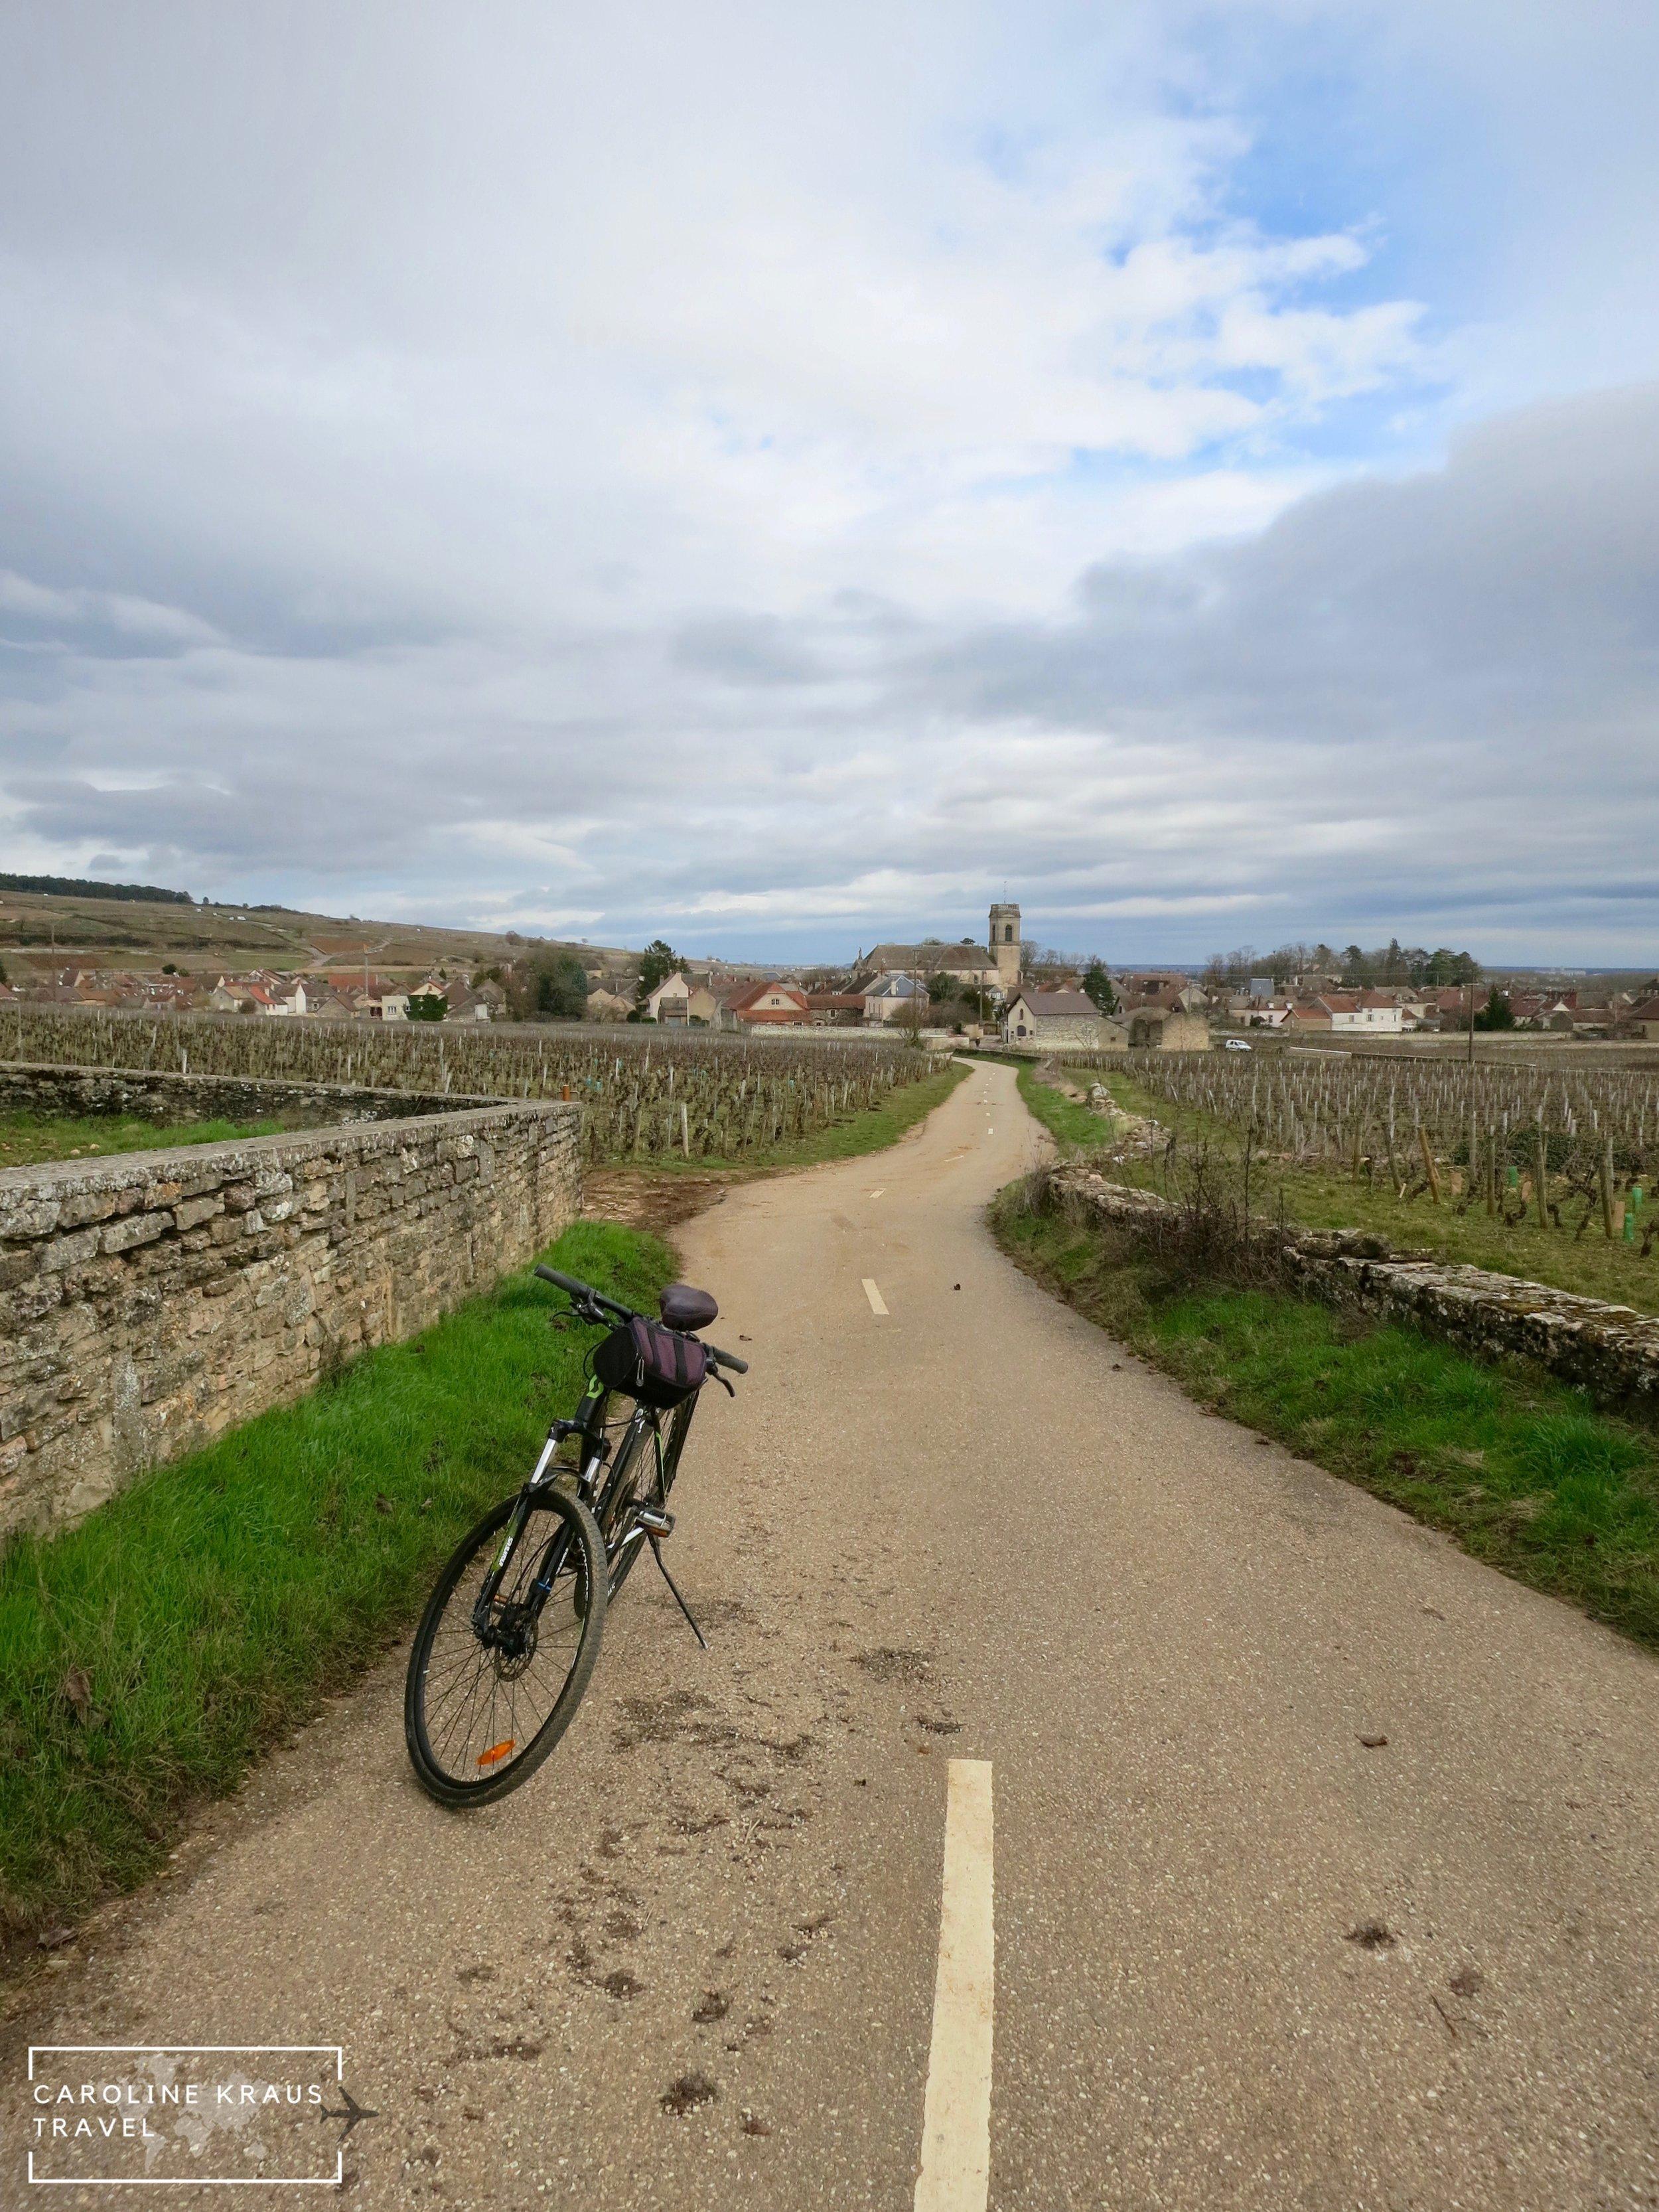 The village of Pommard